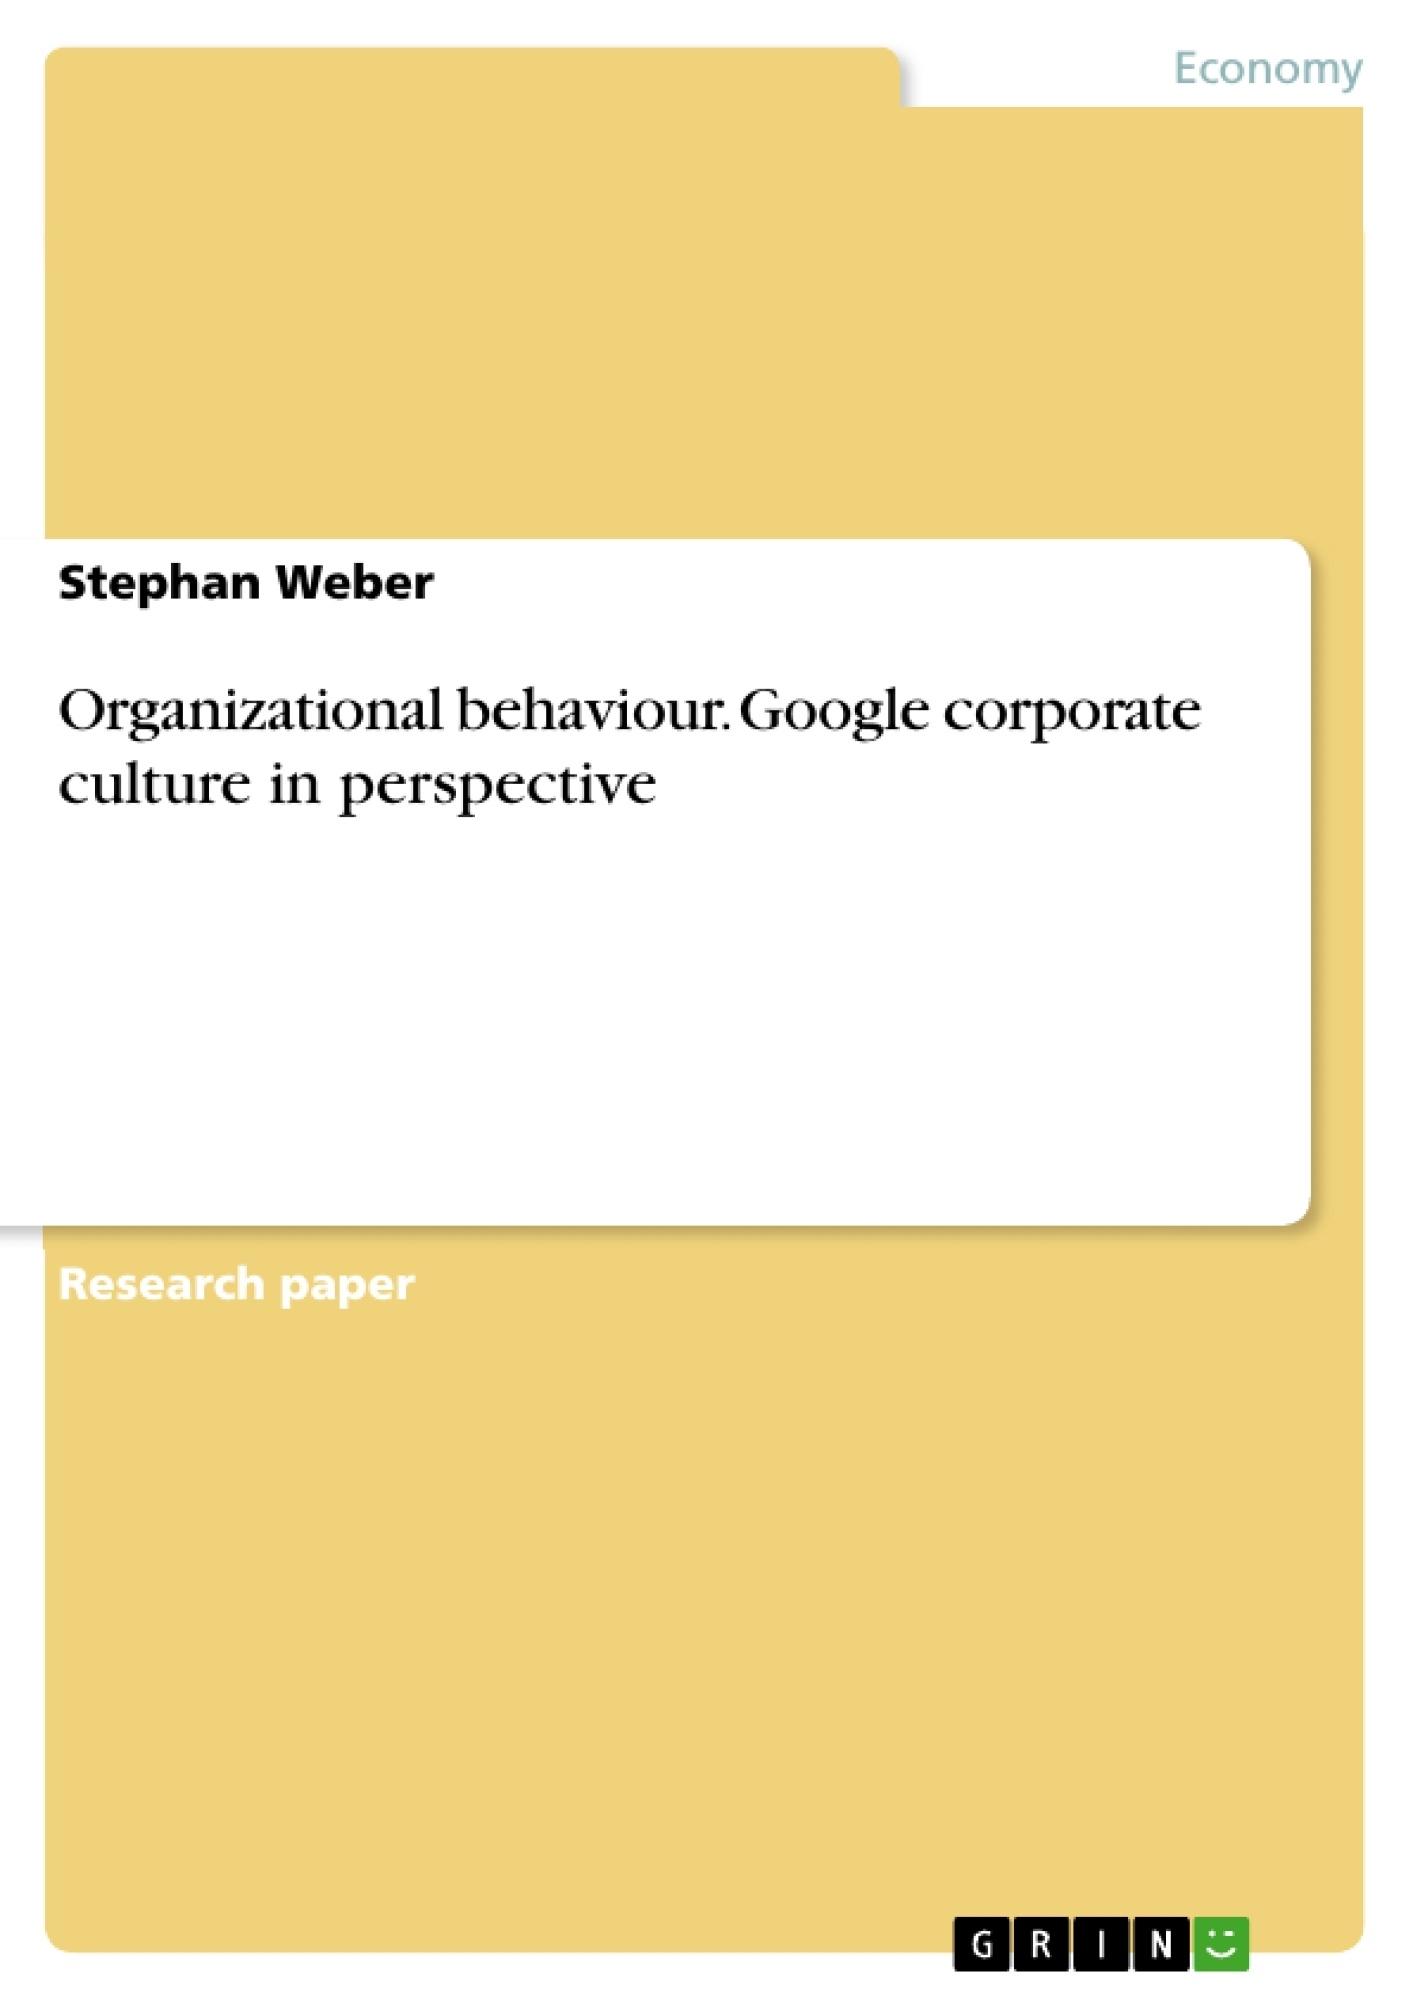 Title: Organizational behaviour. Google corporate culture in perspective